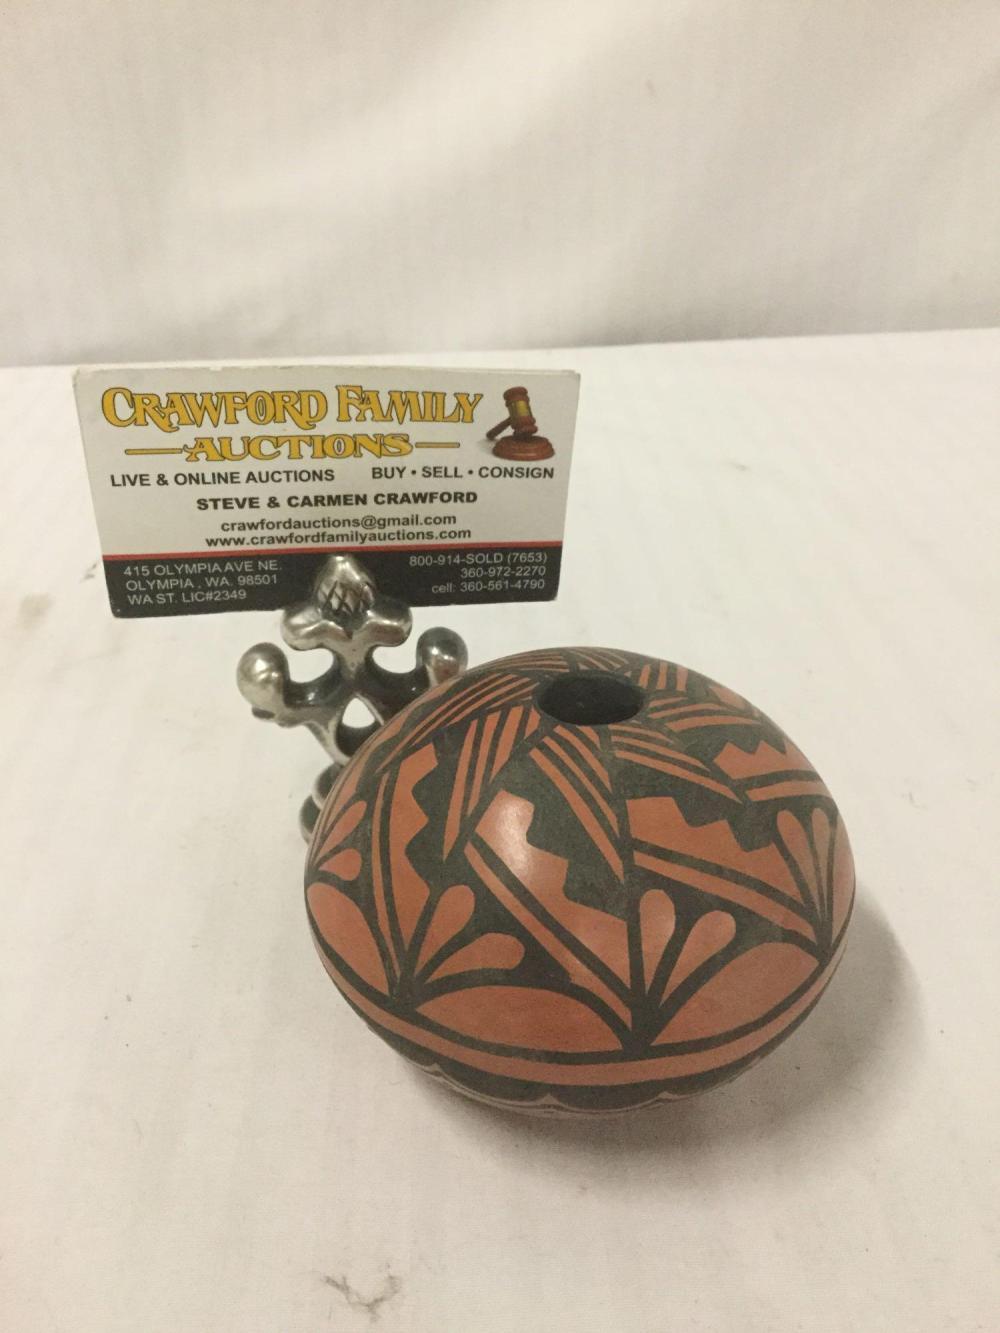 Lot 64: Ceramic seed pot with geometric designs by T. Sando of Jemez, New Mexico